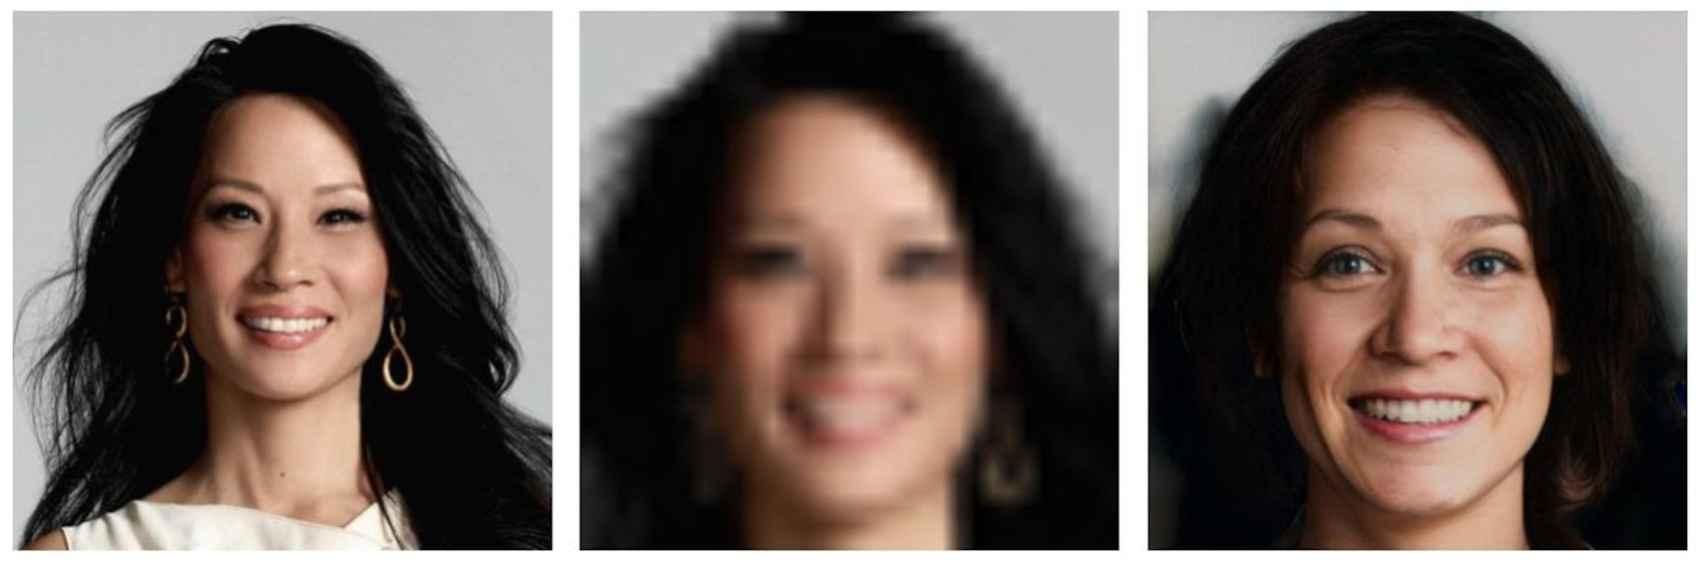 Lucy Liu deja de tener rasgos asiáticos al pasar por esta IA